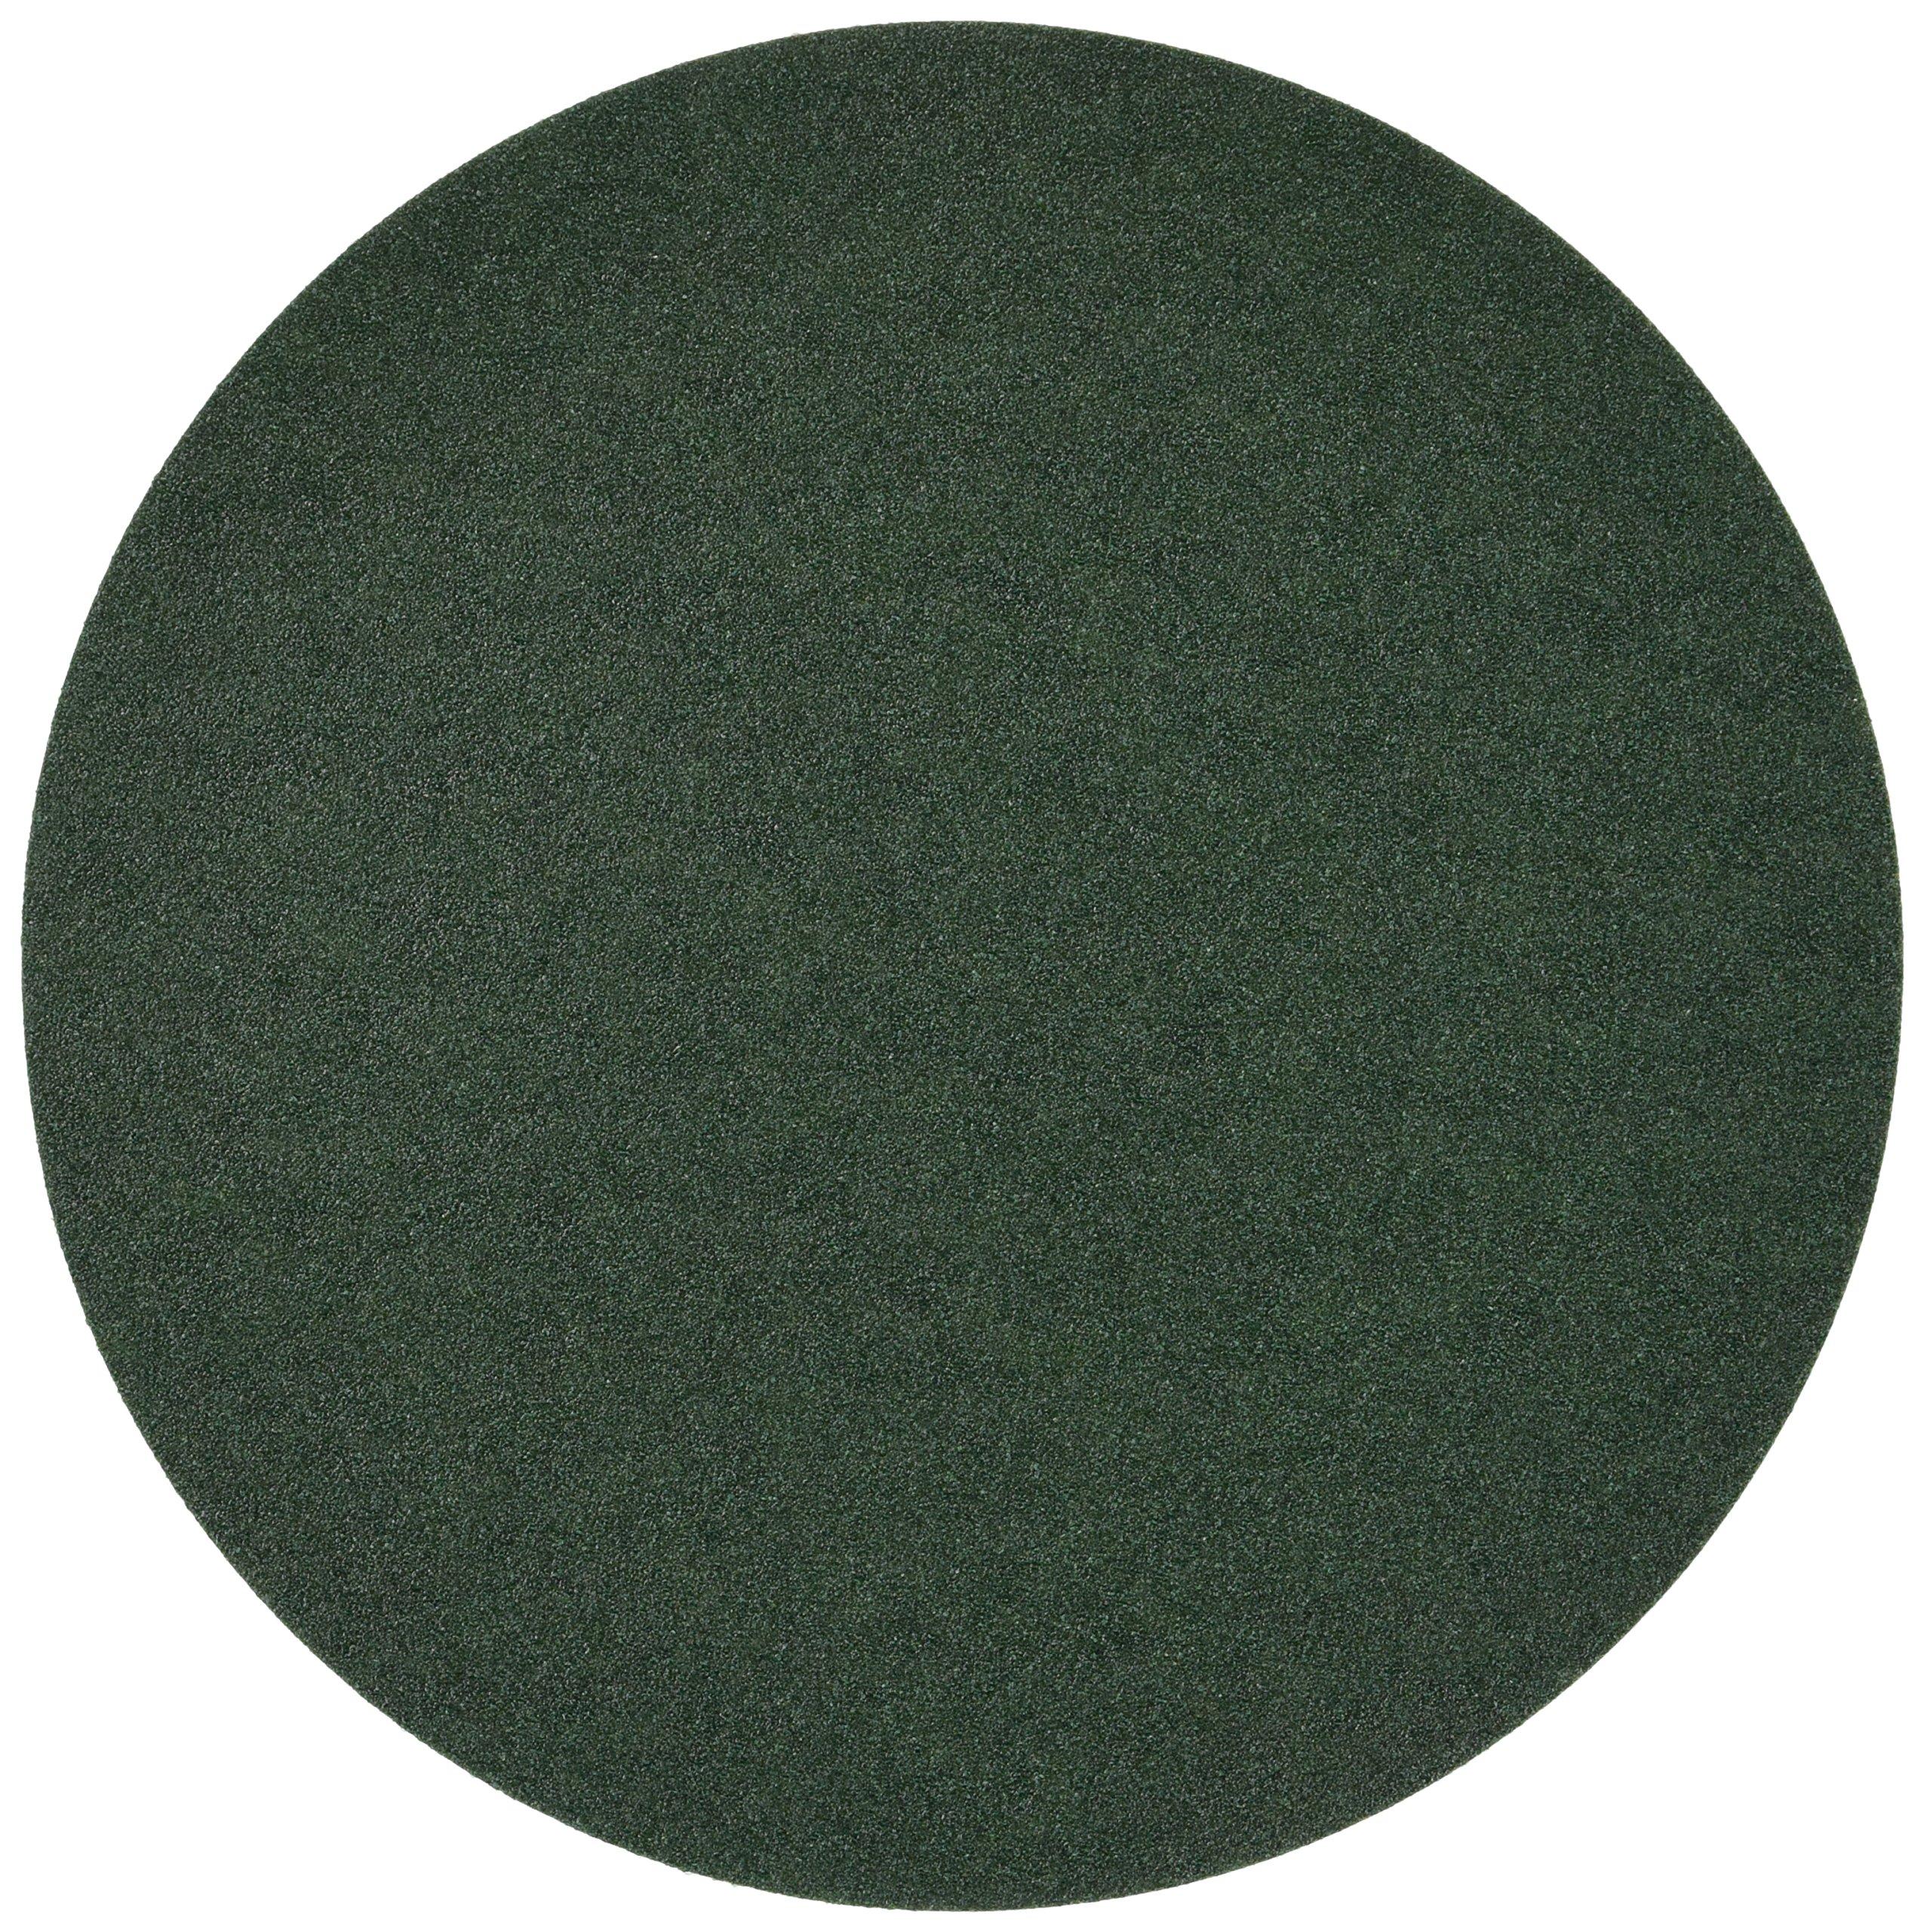 3M Green Corps Hookit Disc, 00520, 8 in, 100, 25 discs per carton